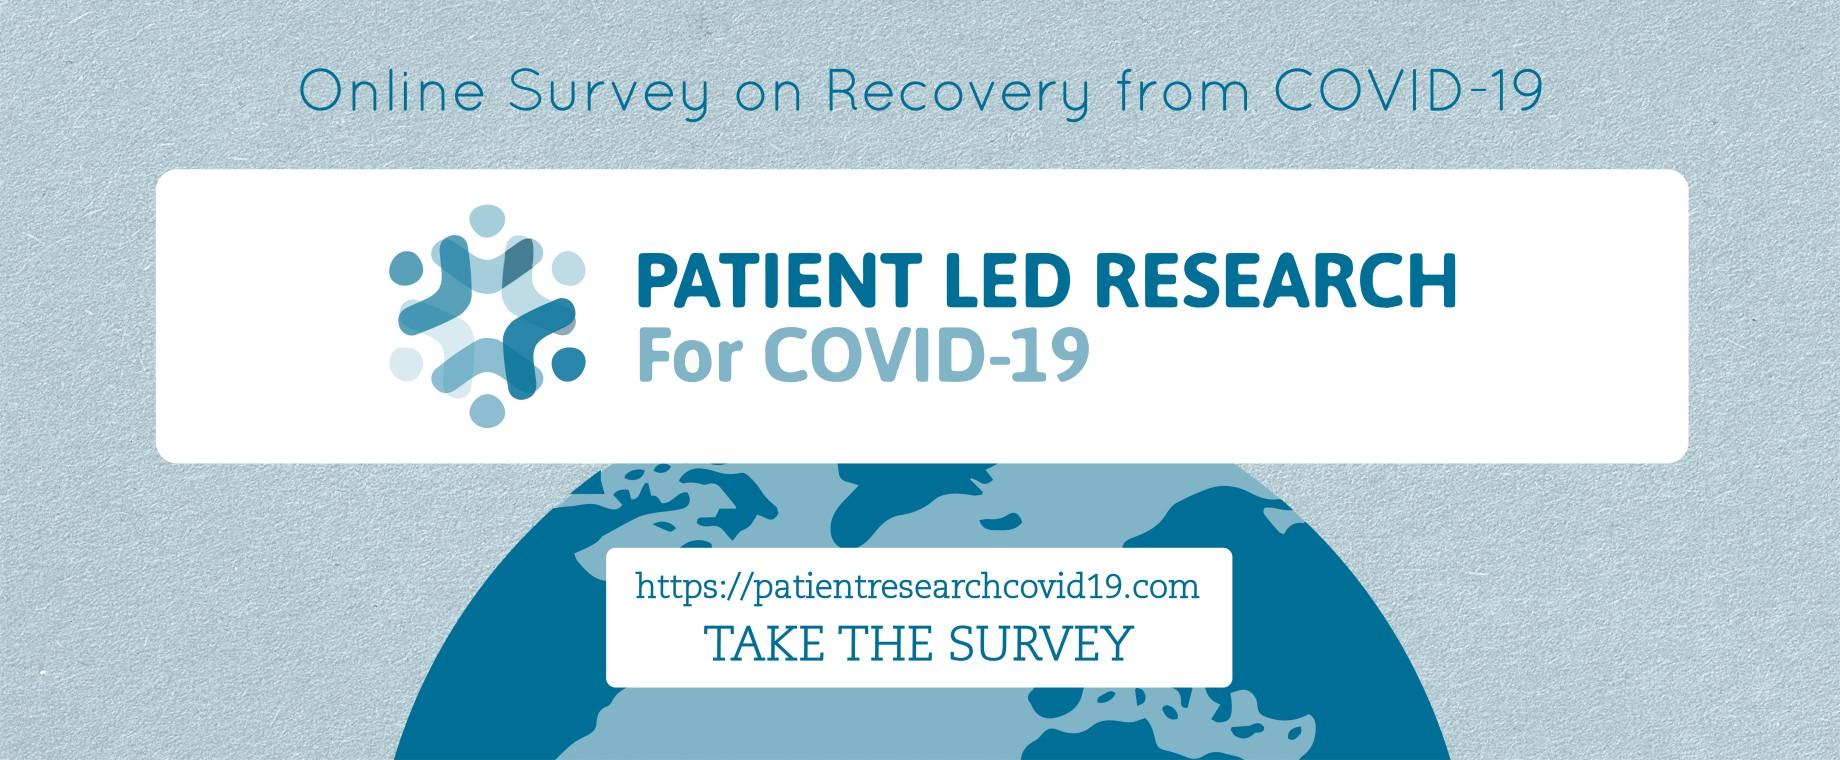 patient-led-research_slide.jpg